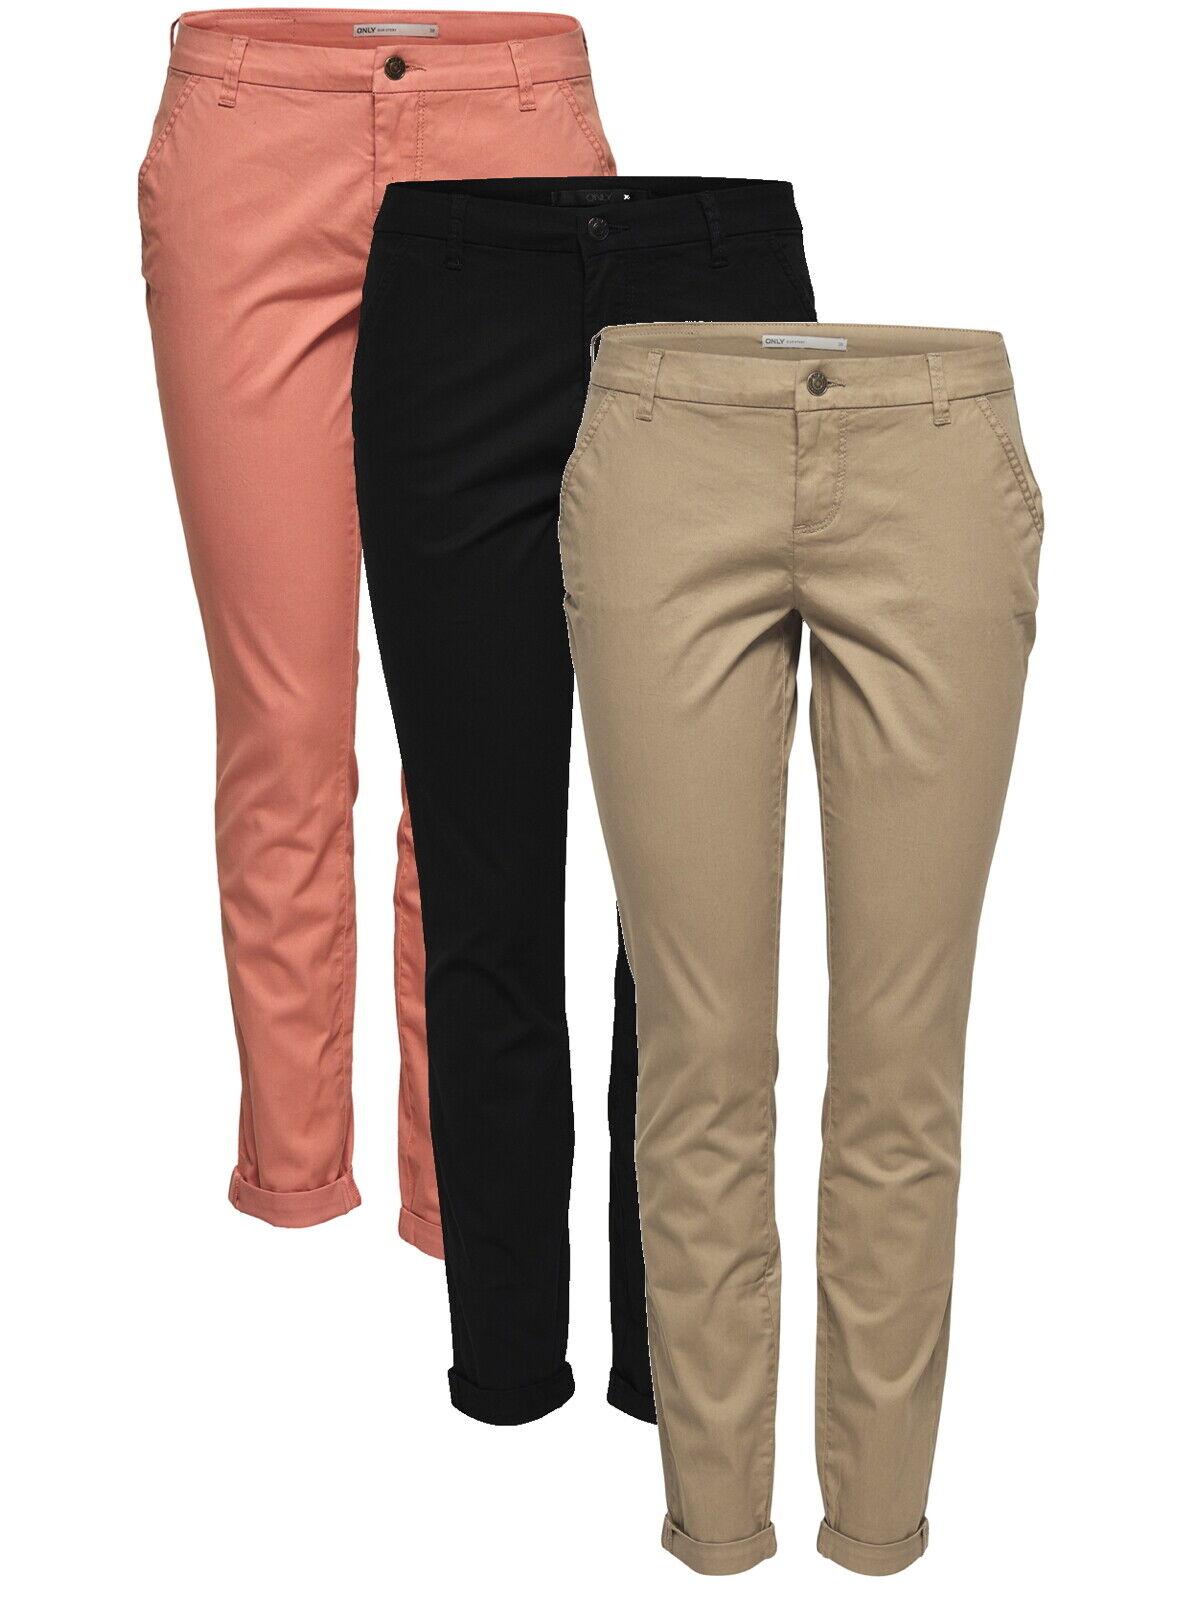 Only Damen Hose onlParis Chino-Hose 15133544 Stoff-Pant gr.34-42 modisch elegant